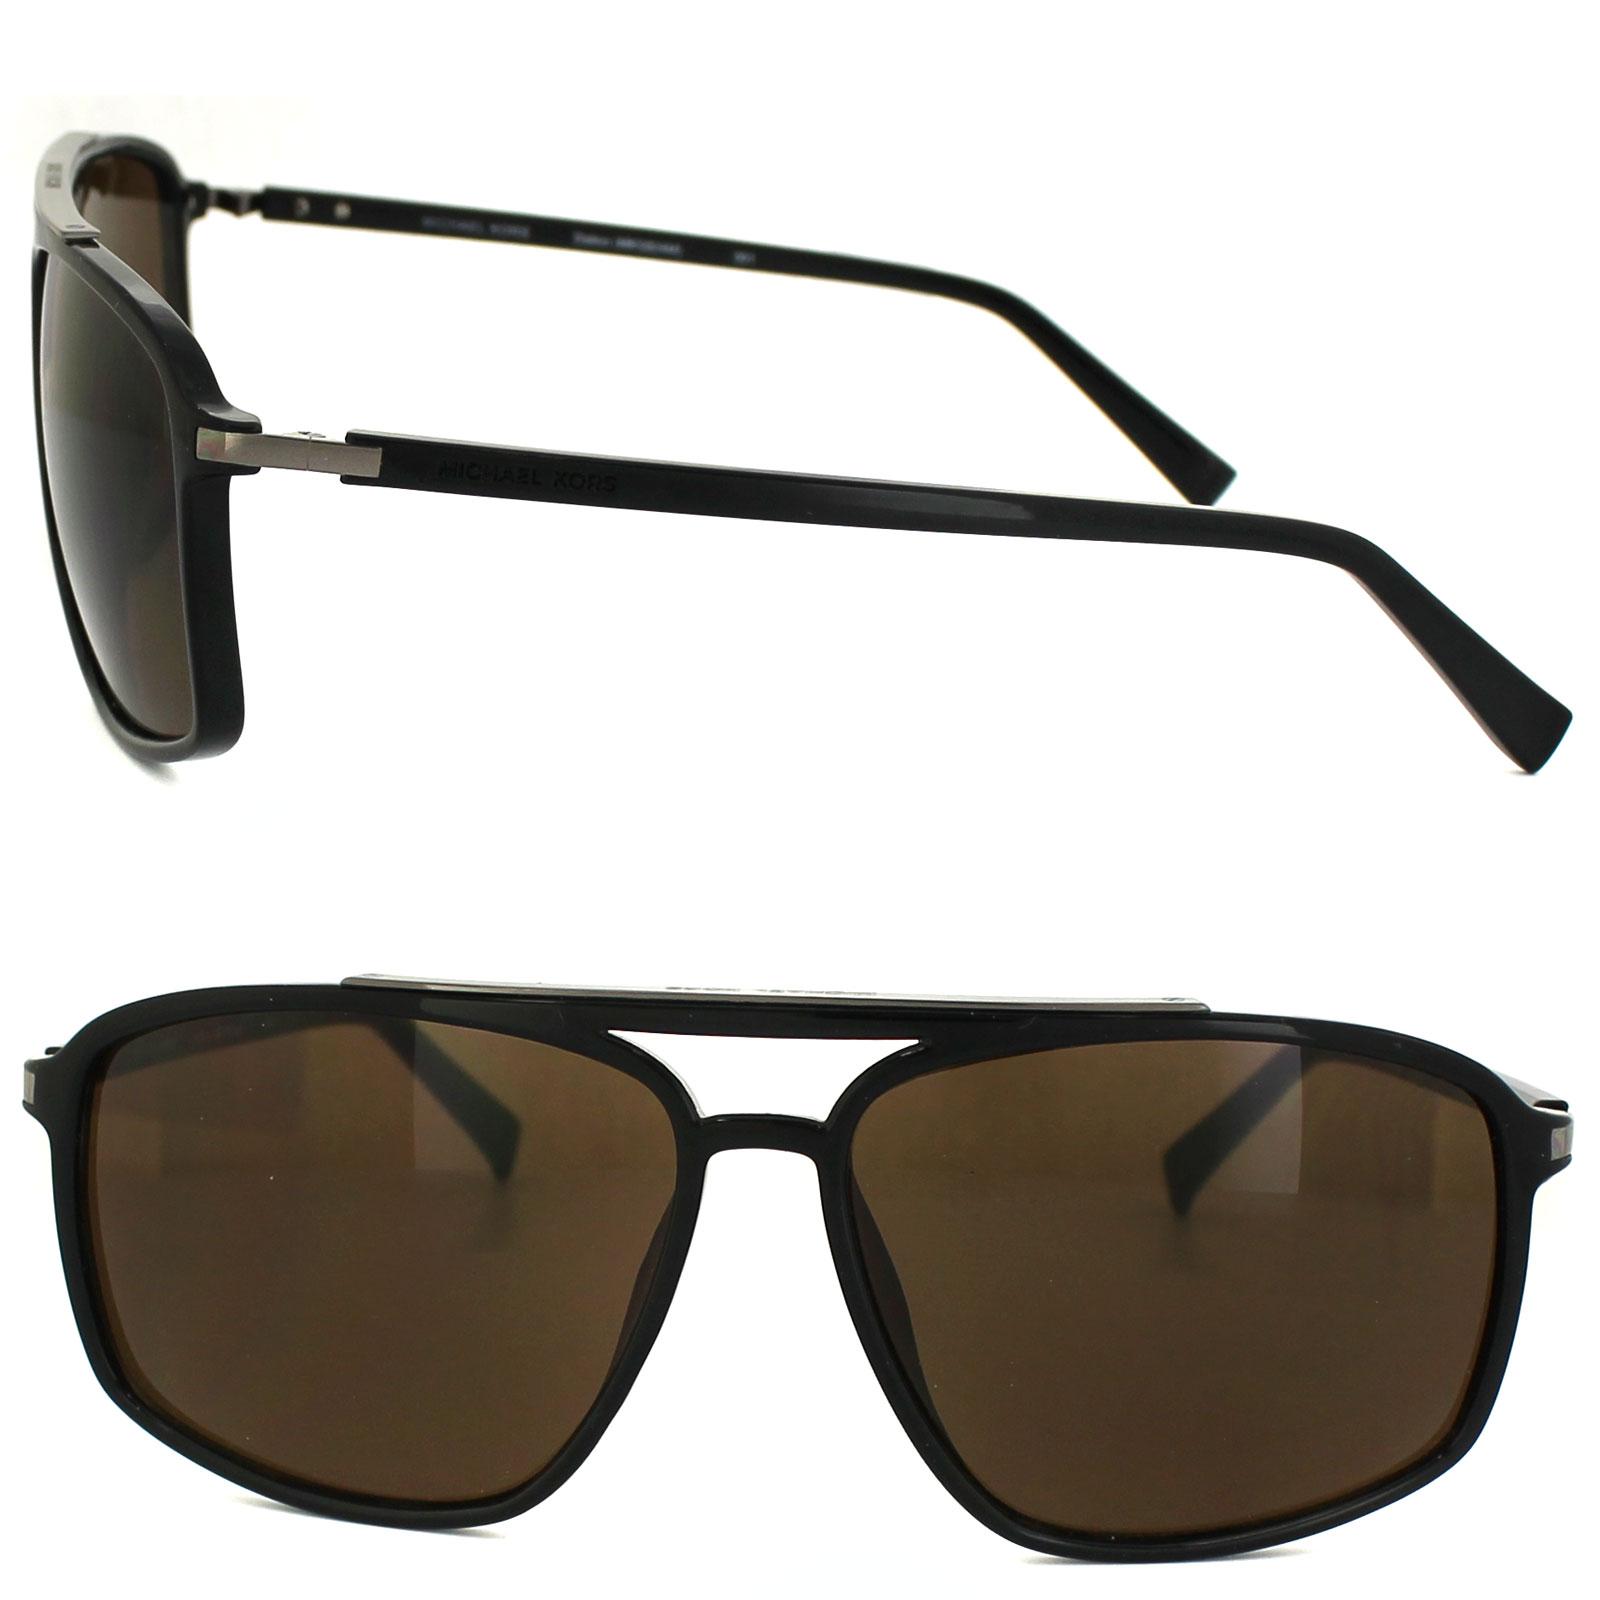 03cd262b27 Michael Kors Dalton MKS824M Sunglasses Thumbnail 1 Michael Kors Dalton  MKS824M Sunglasses Thumbnail 2 ...